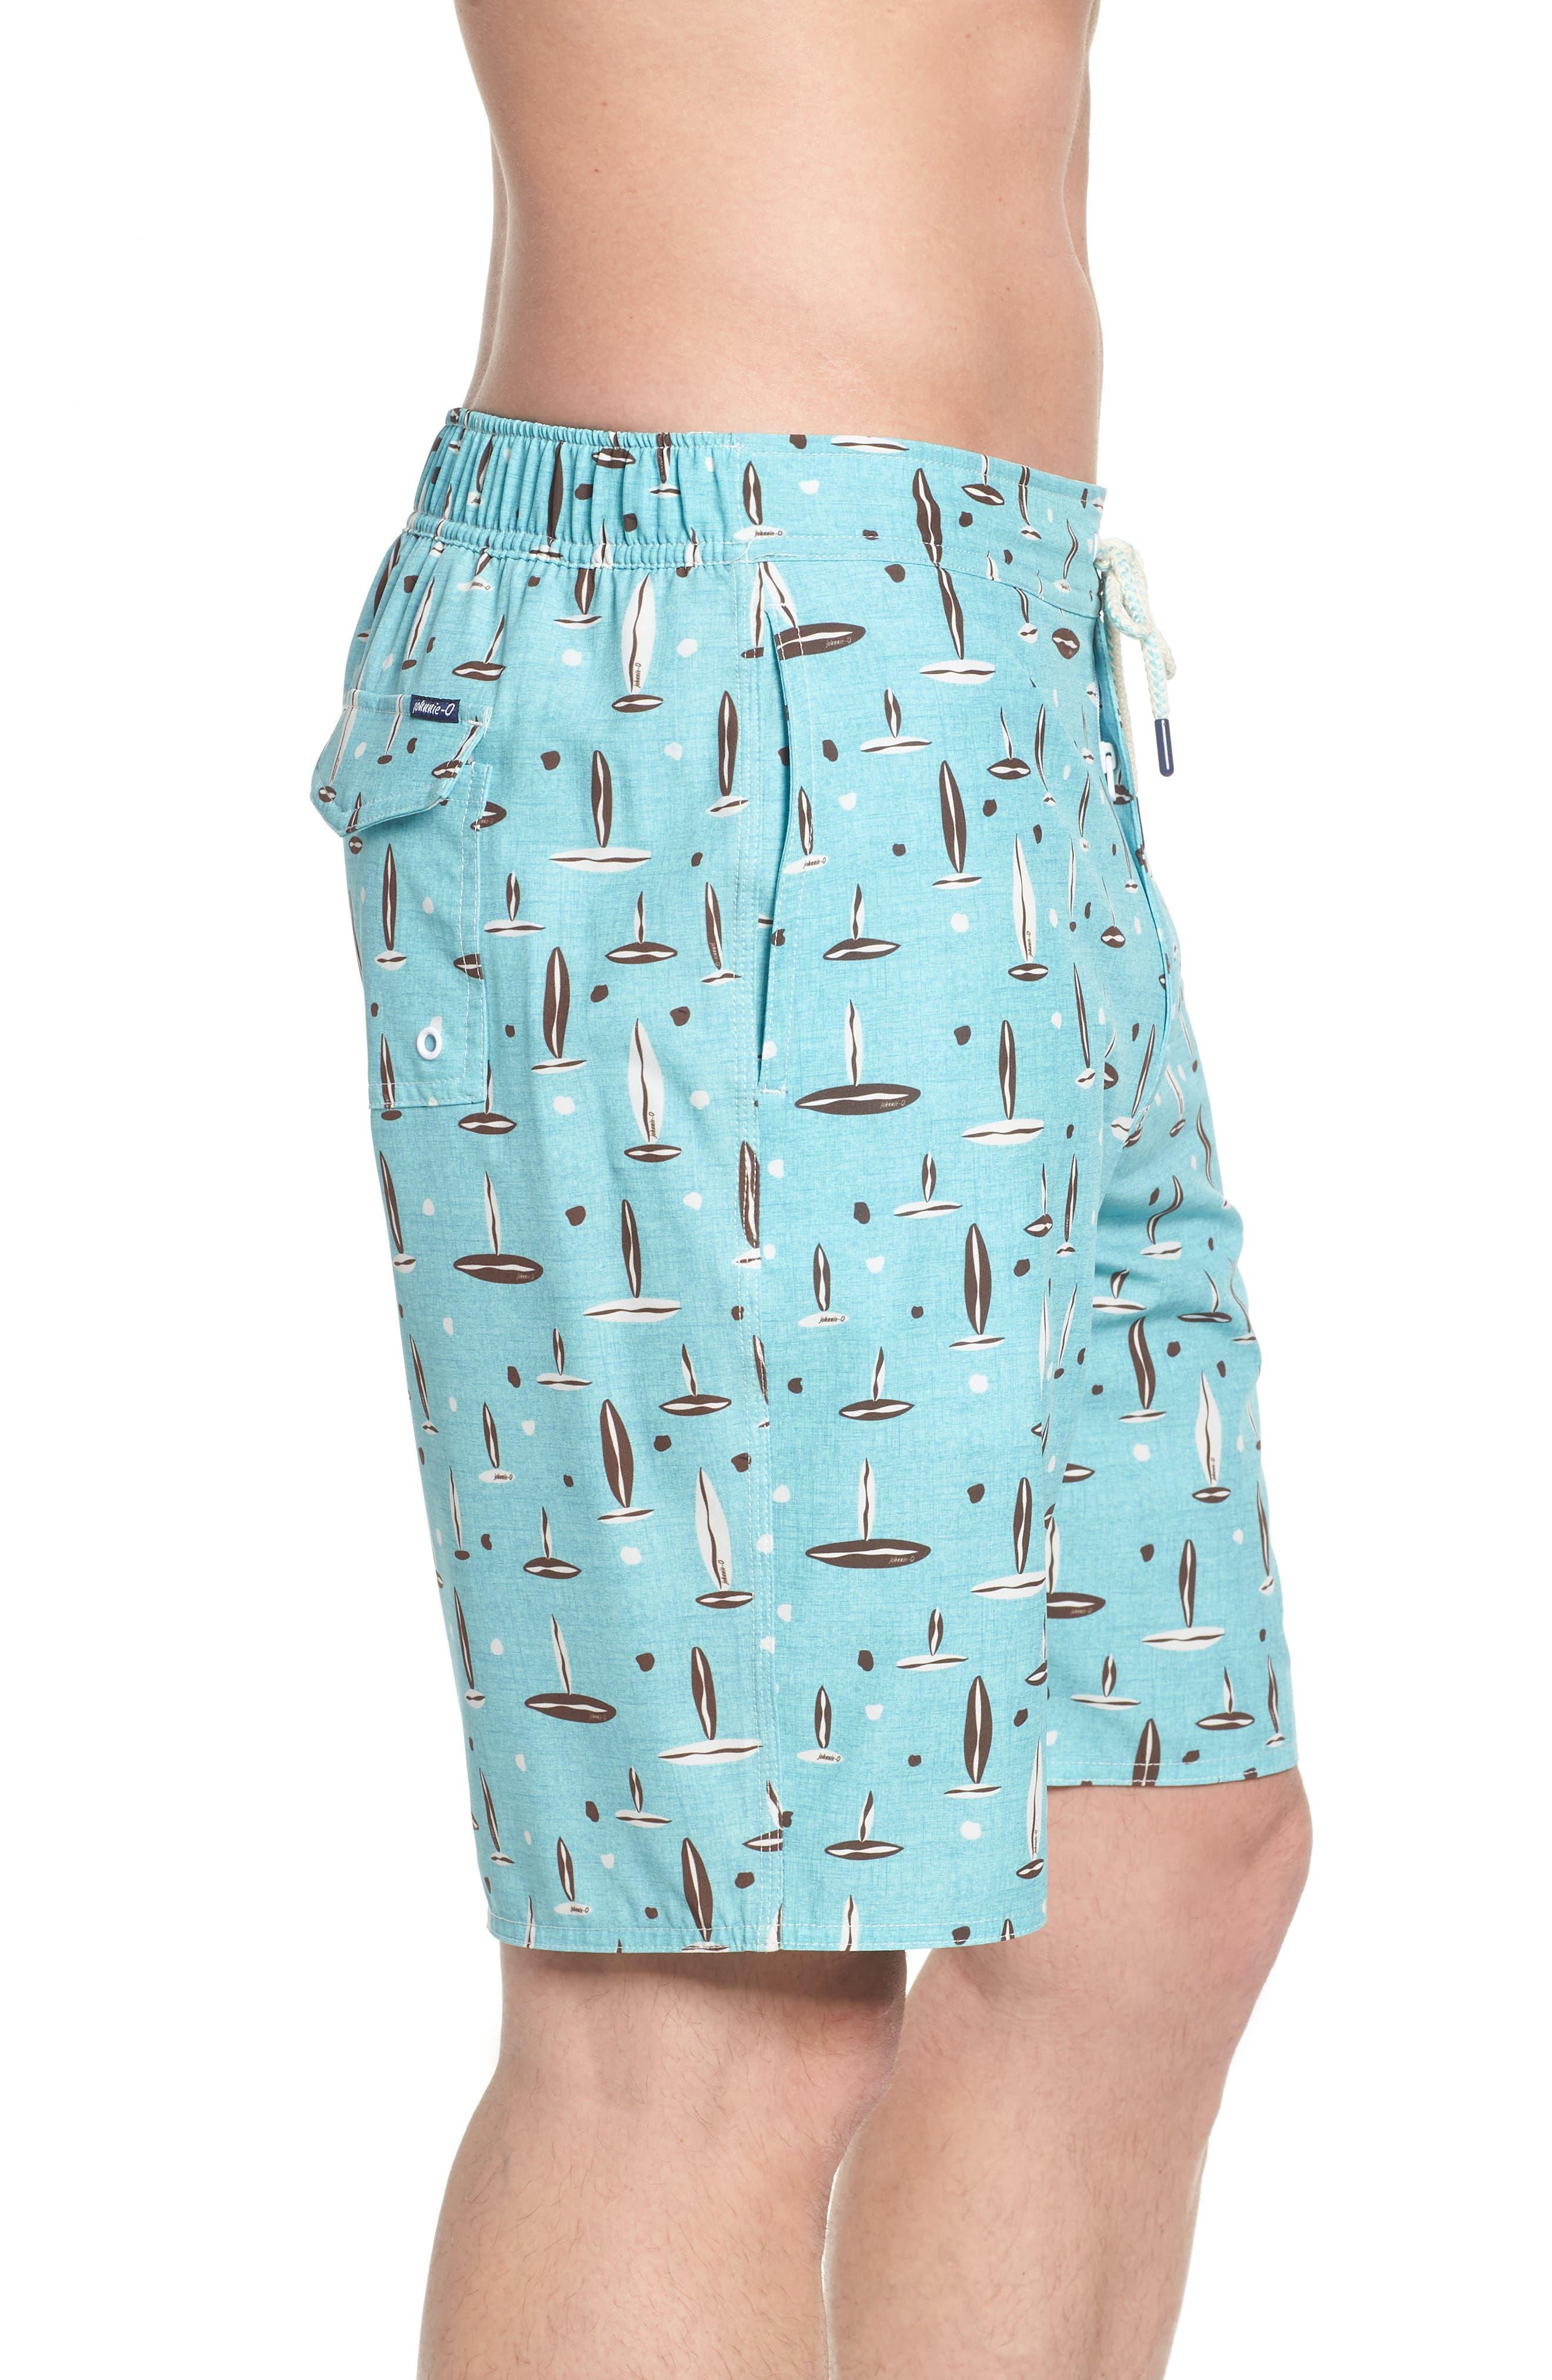 Rowan Regular Fit Board Shorts,                             Alternate thumbnail 3, color,                             SURF